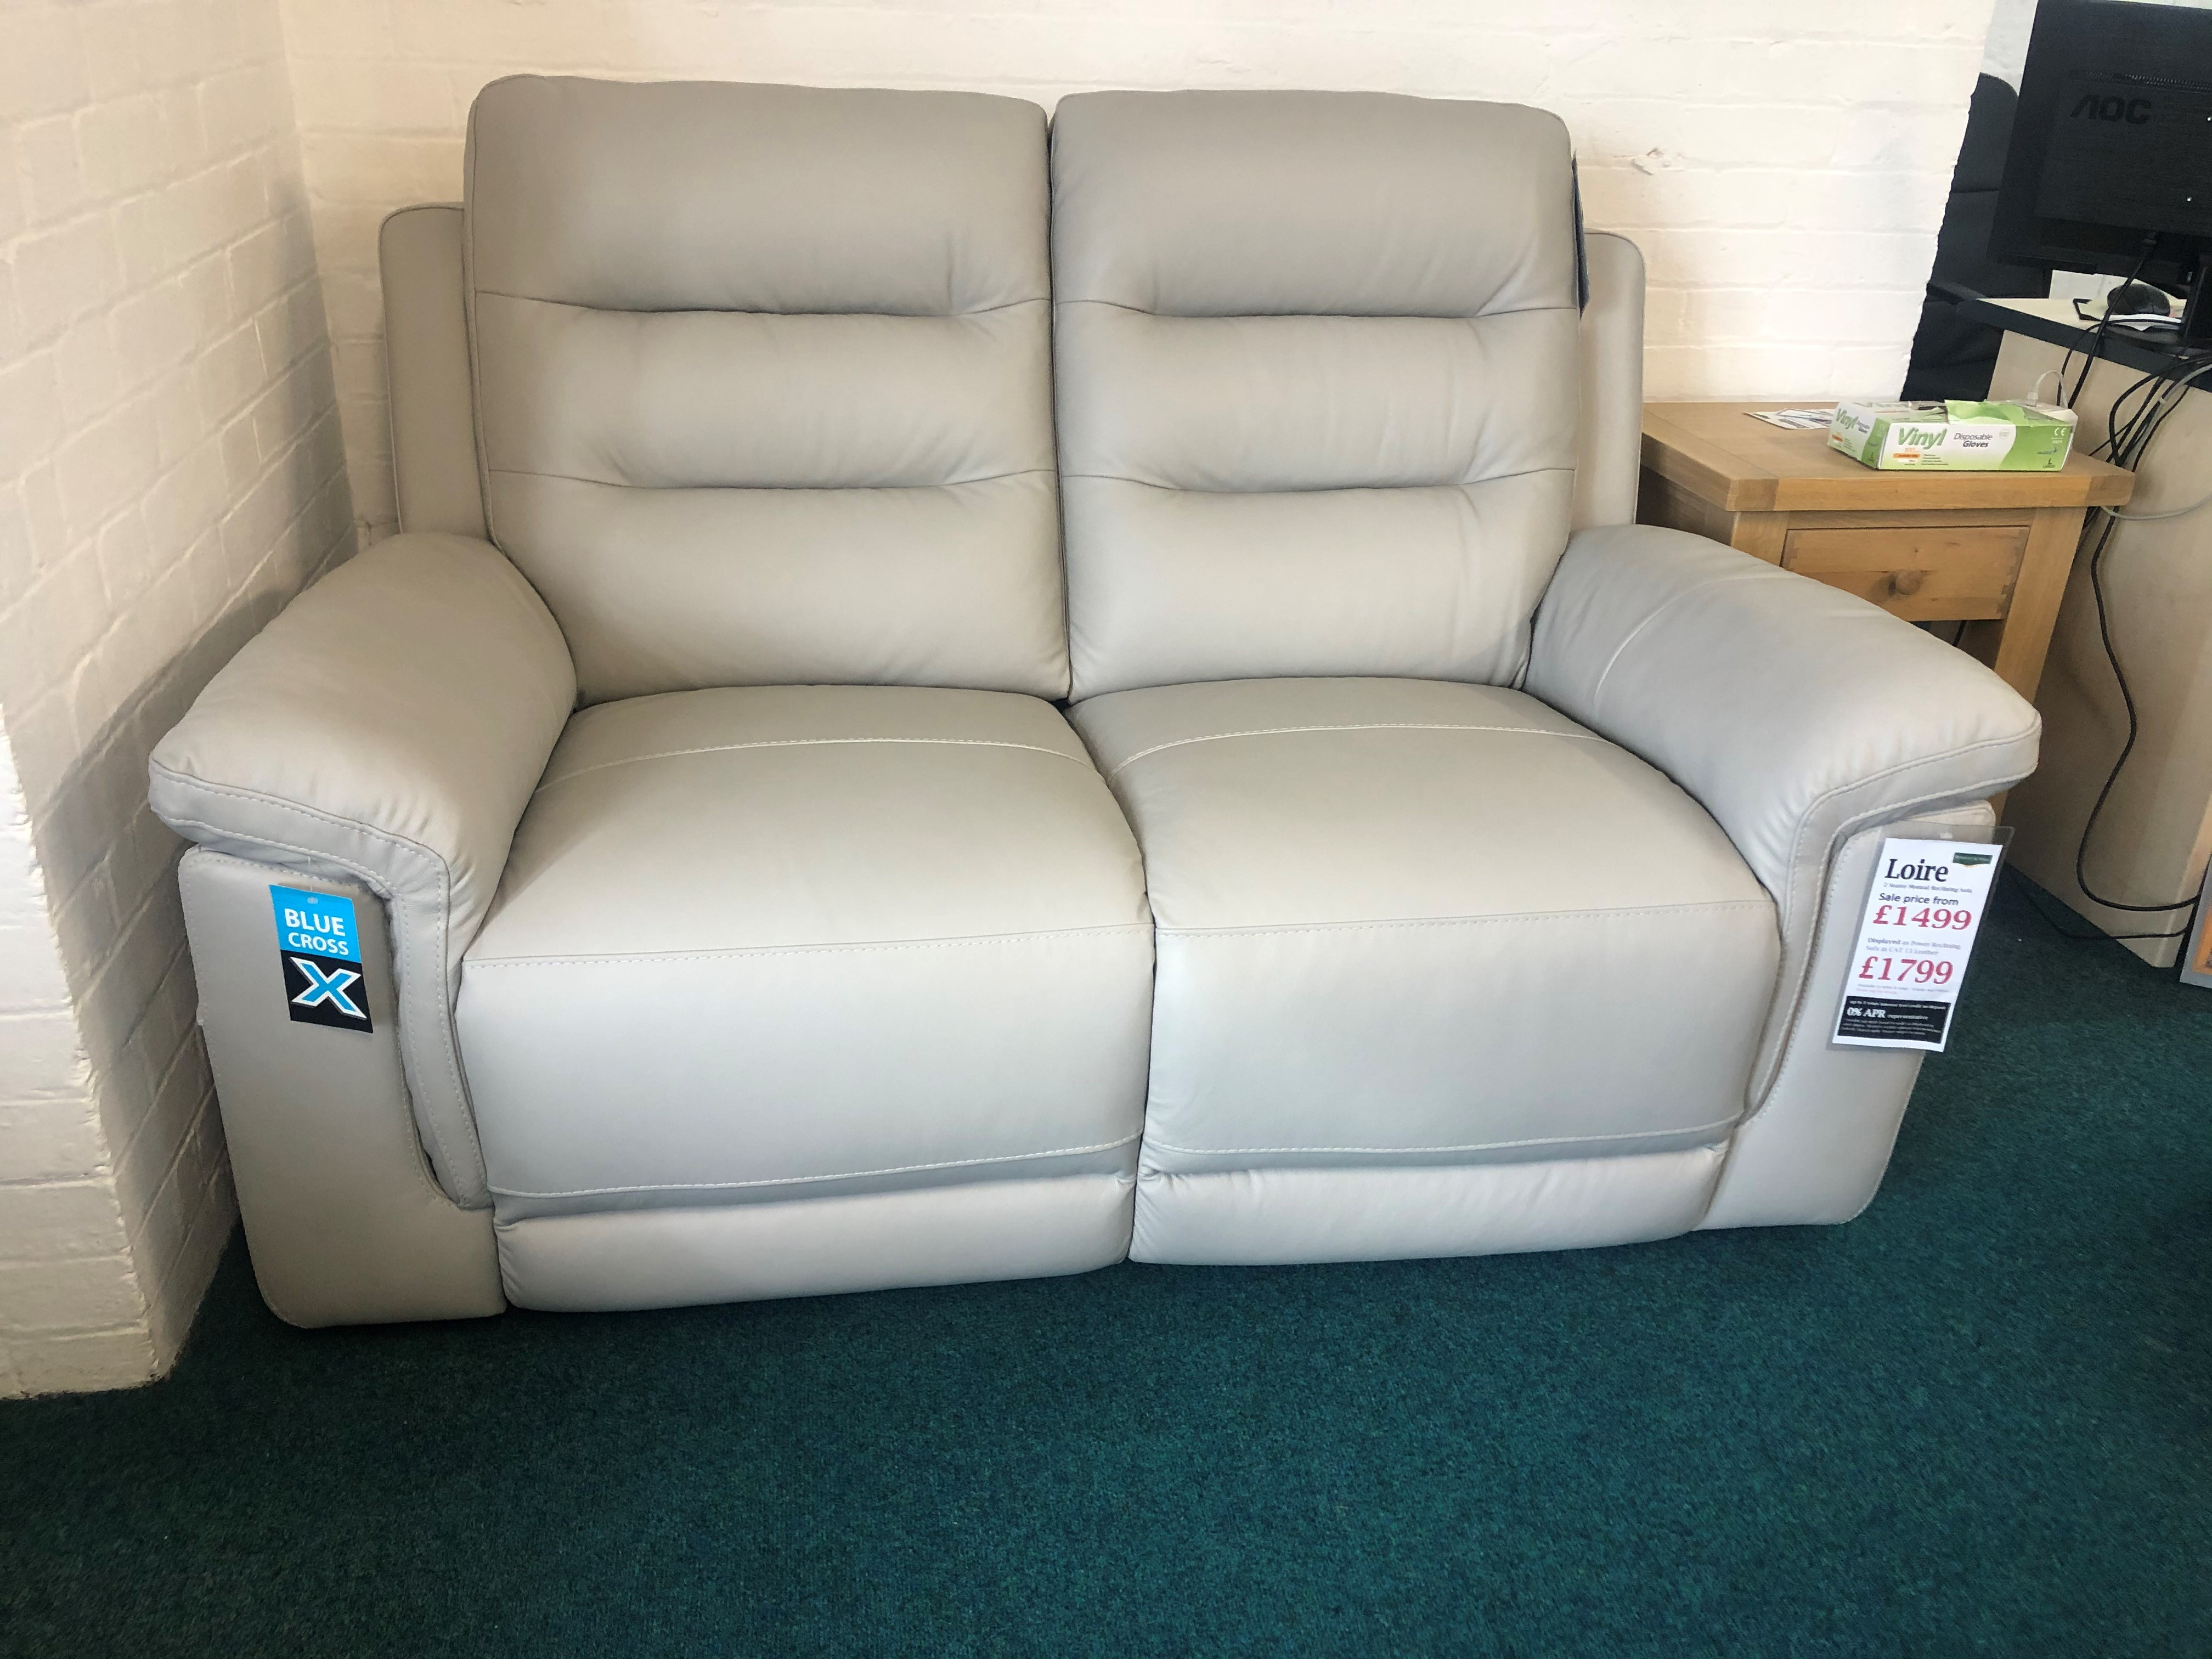 Loire 2 Seater Sofa